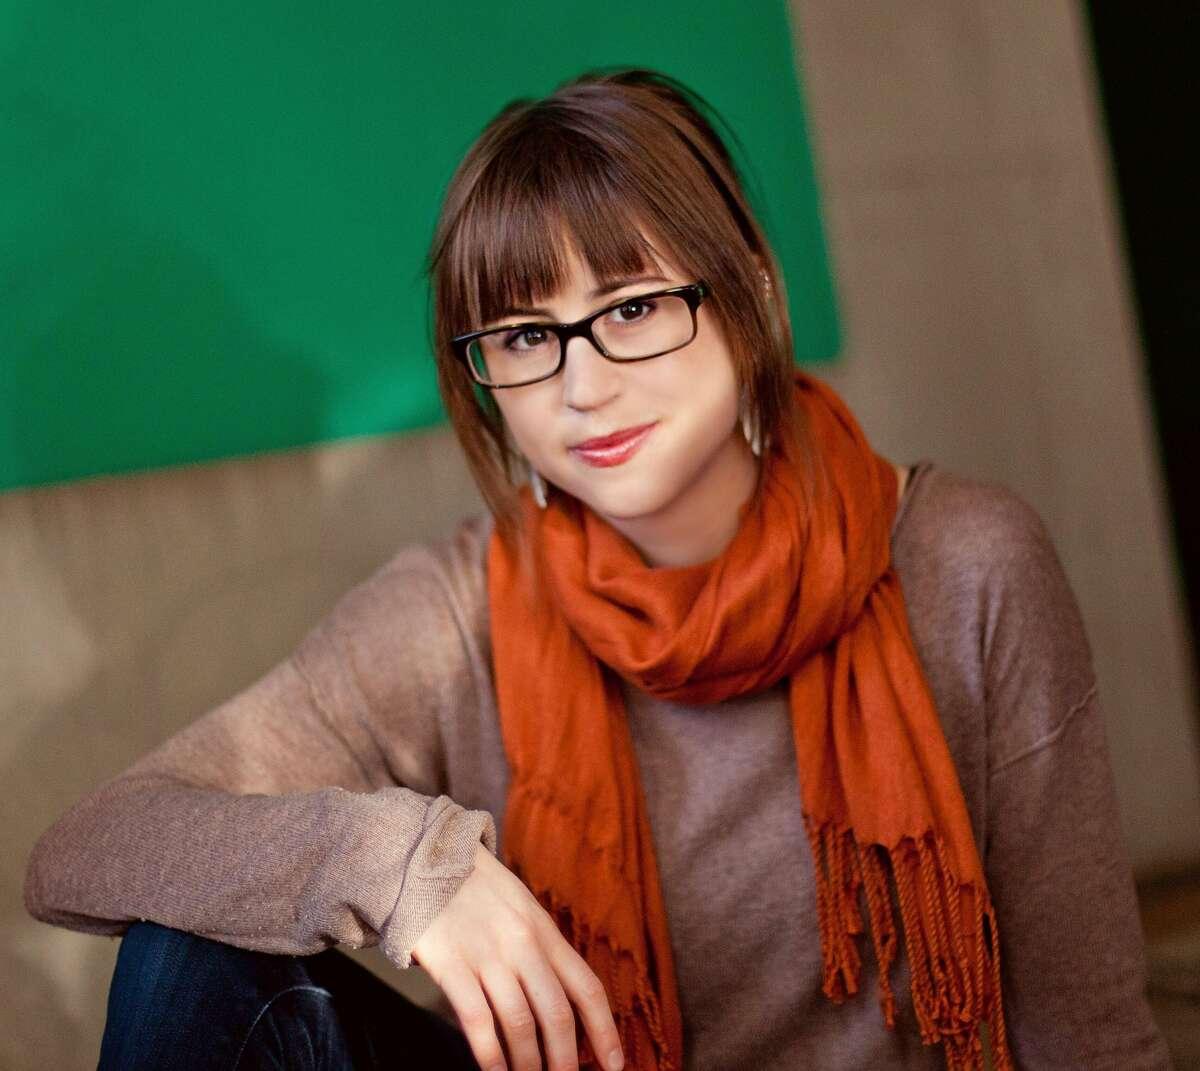 Composer Katherine Balch